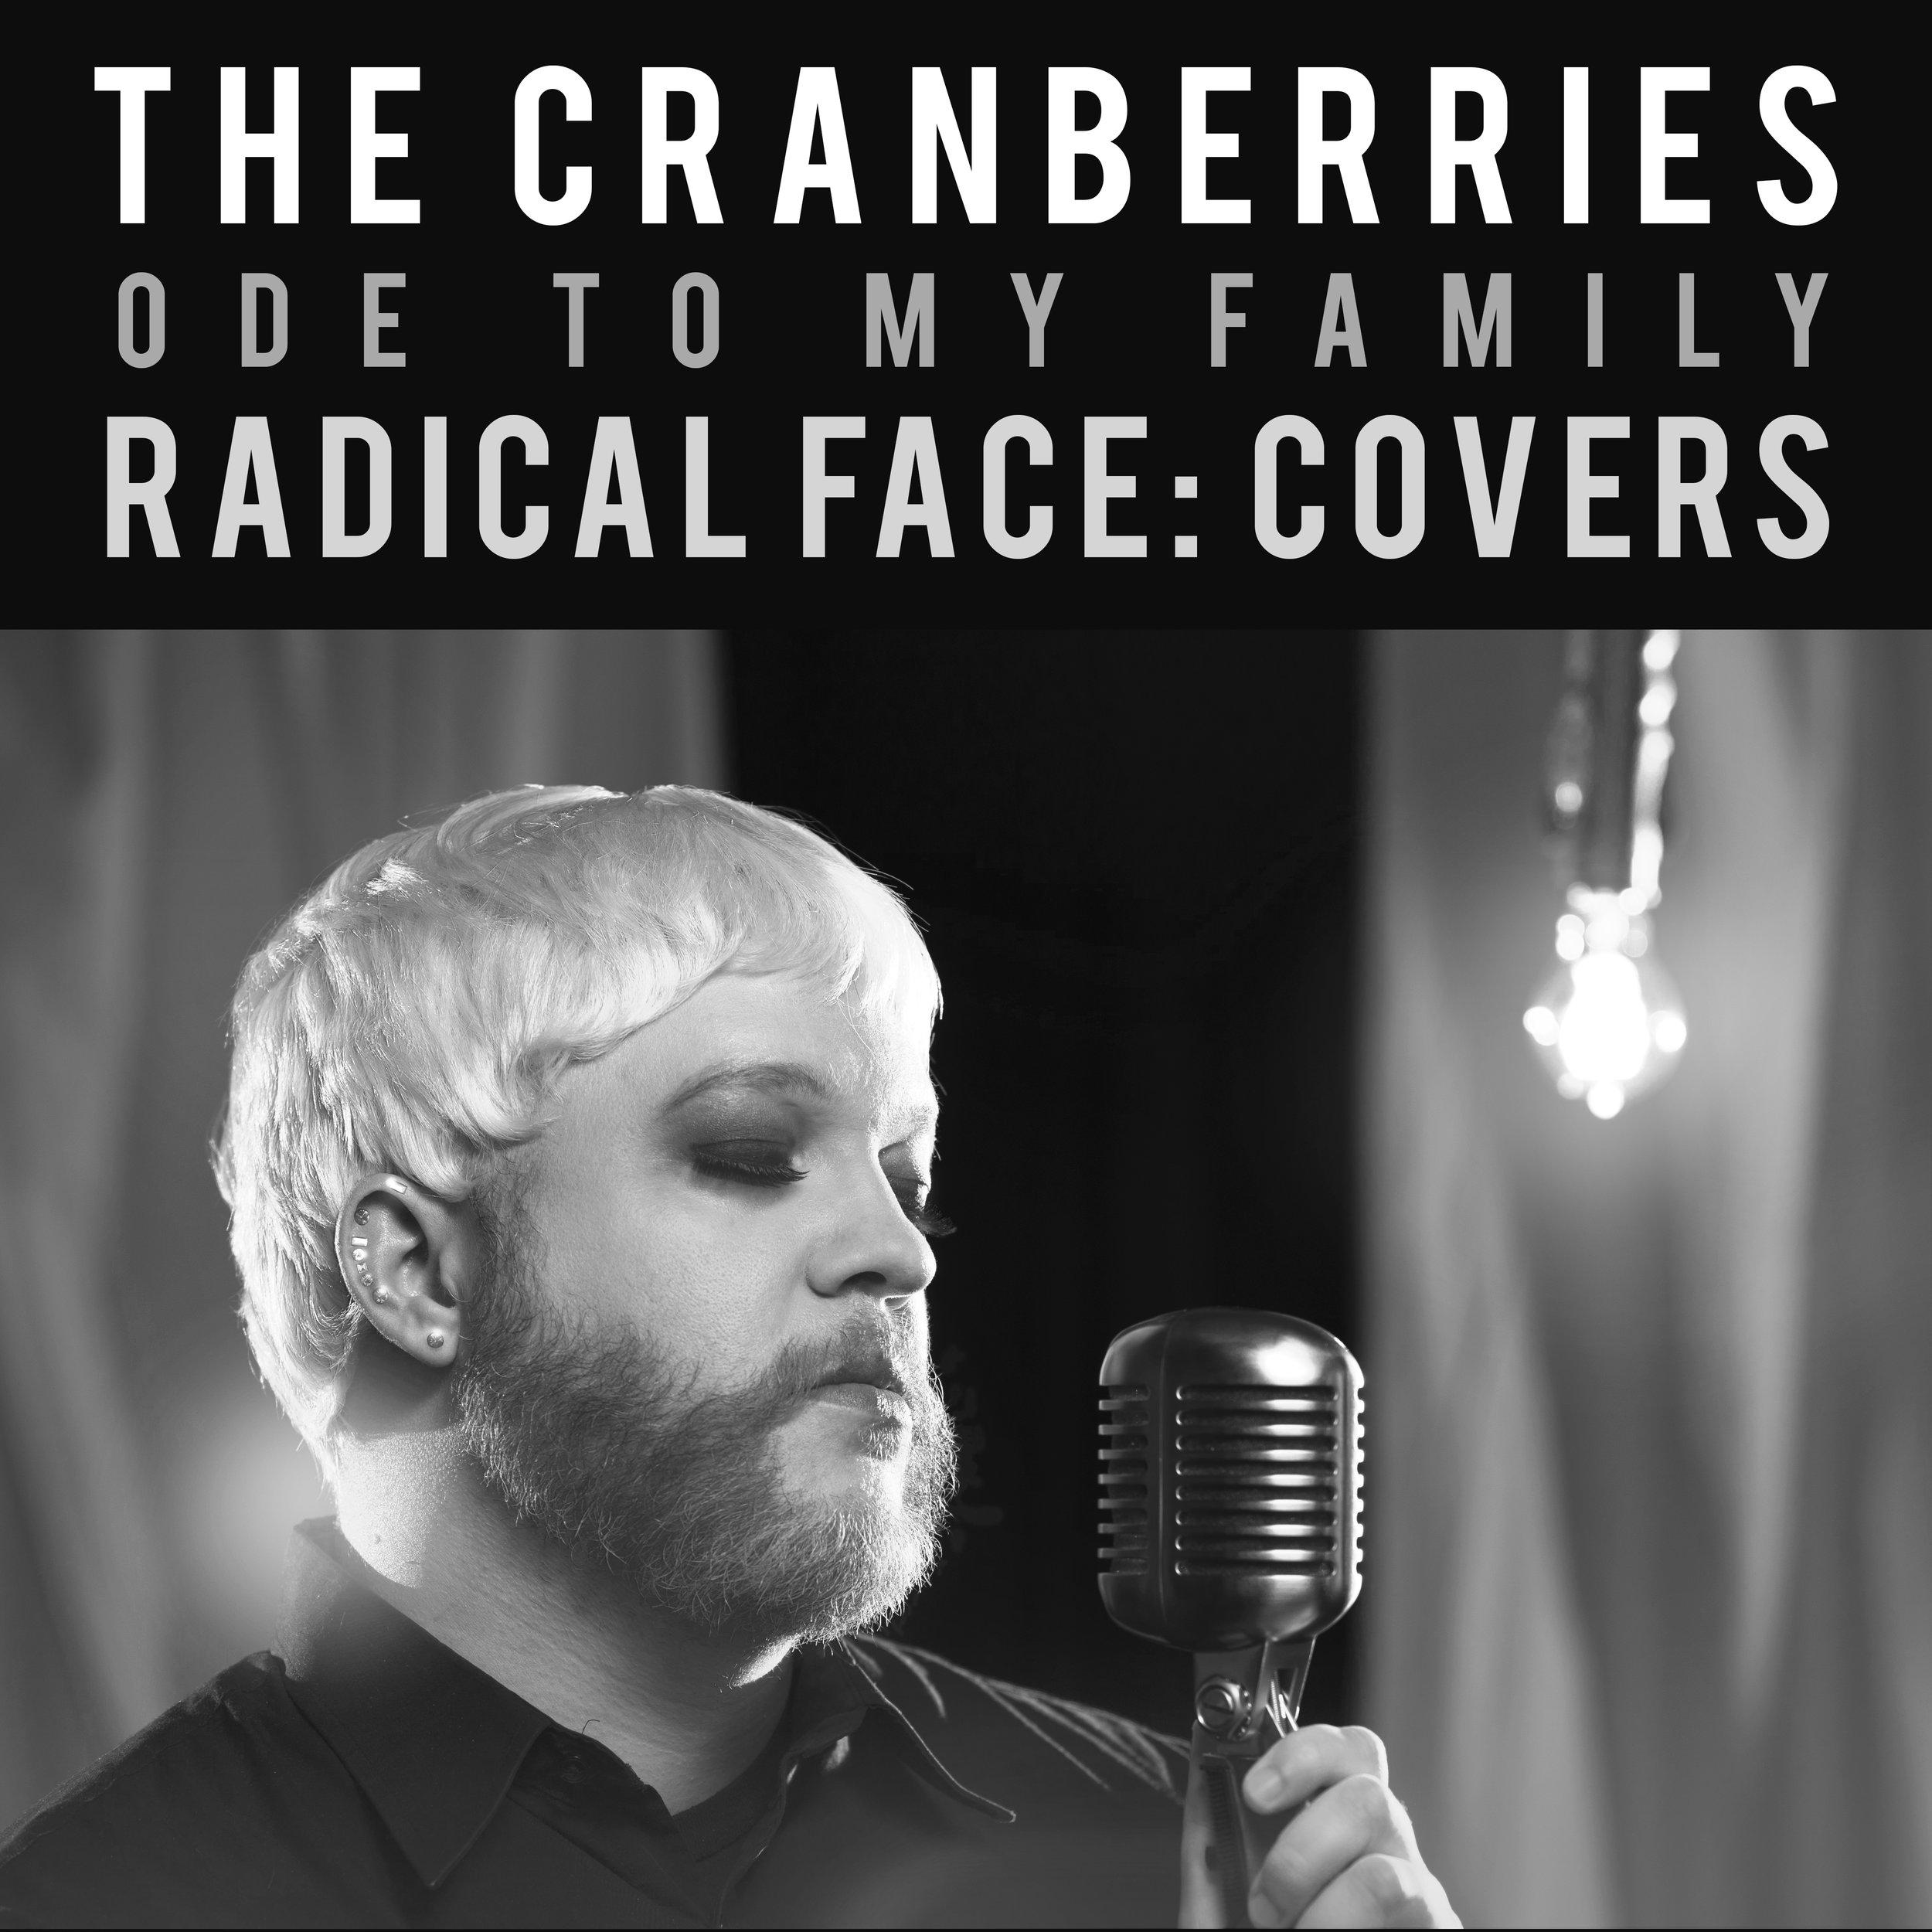 Cranberries_OdeToMyFamily_CoverArt.jpg